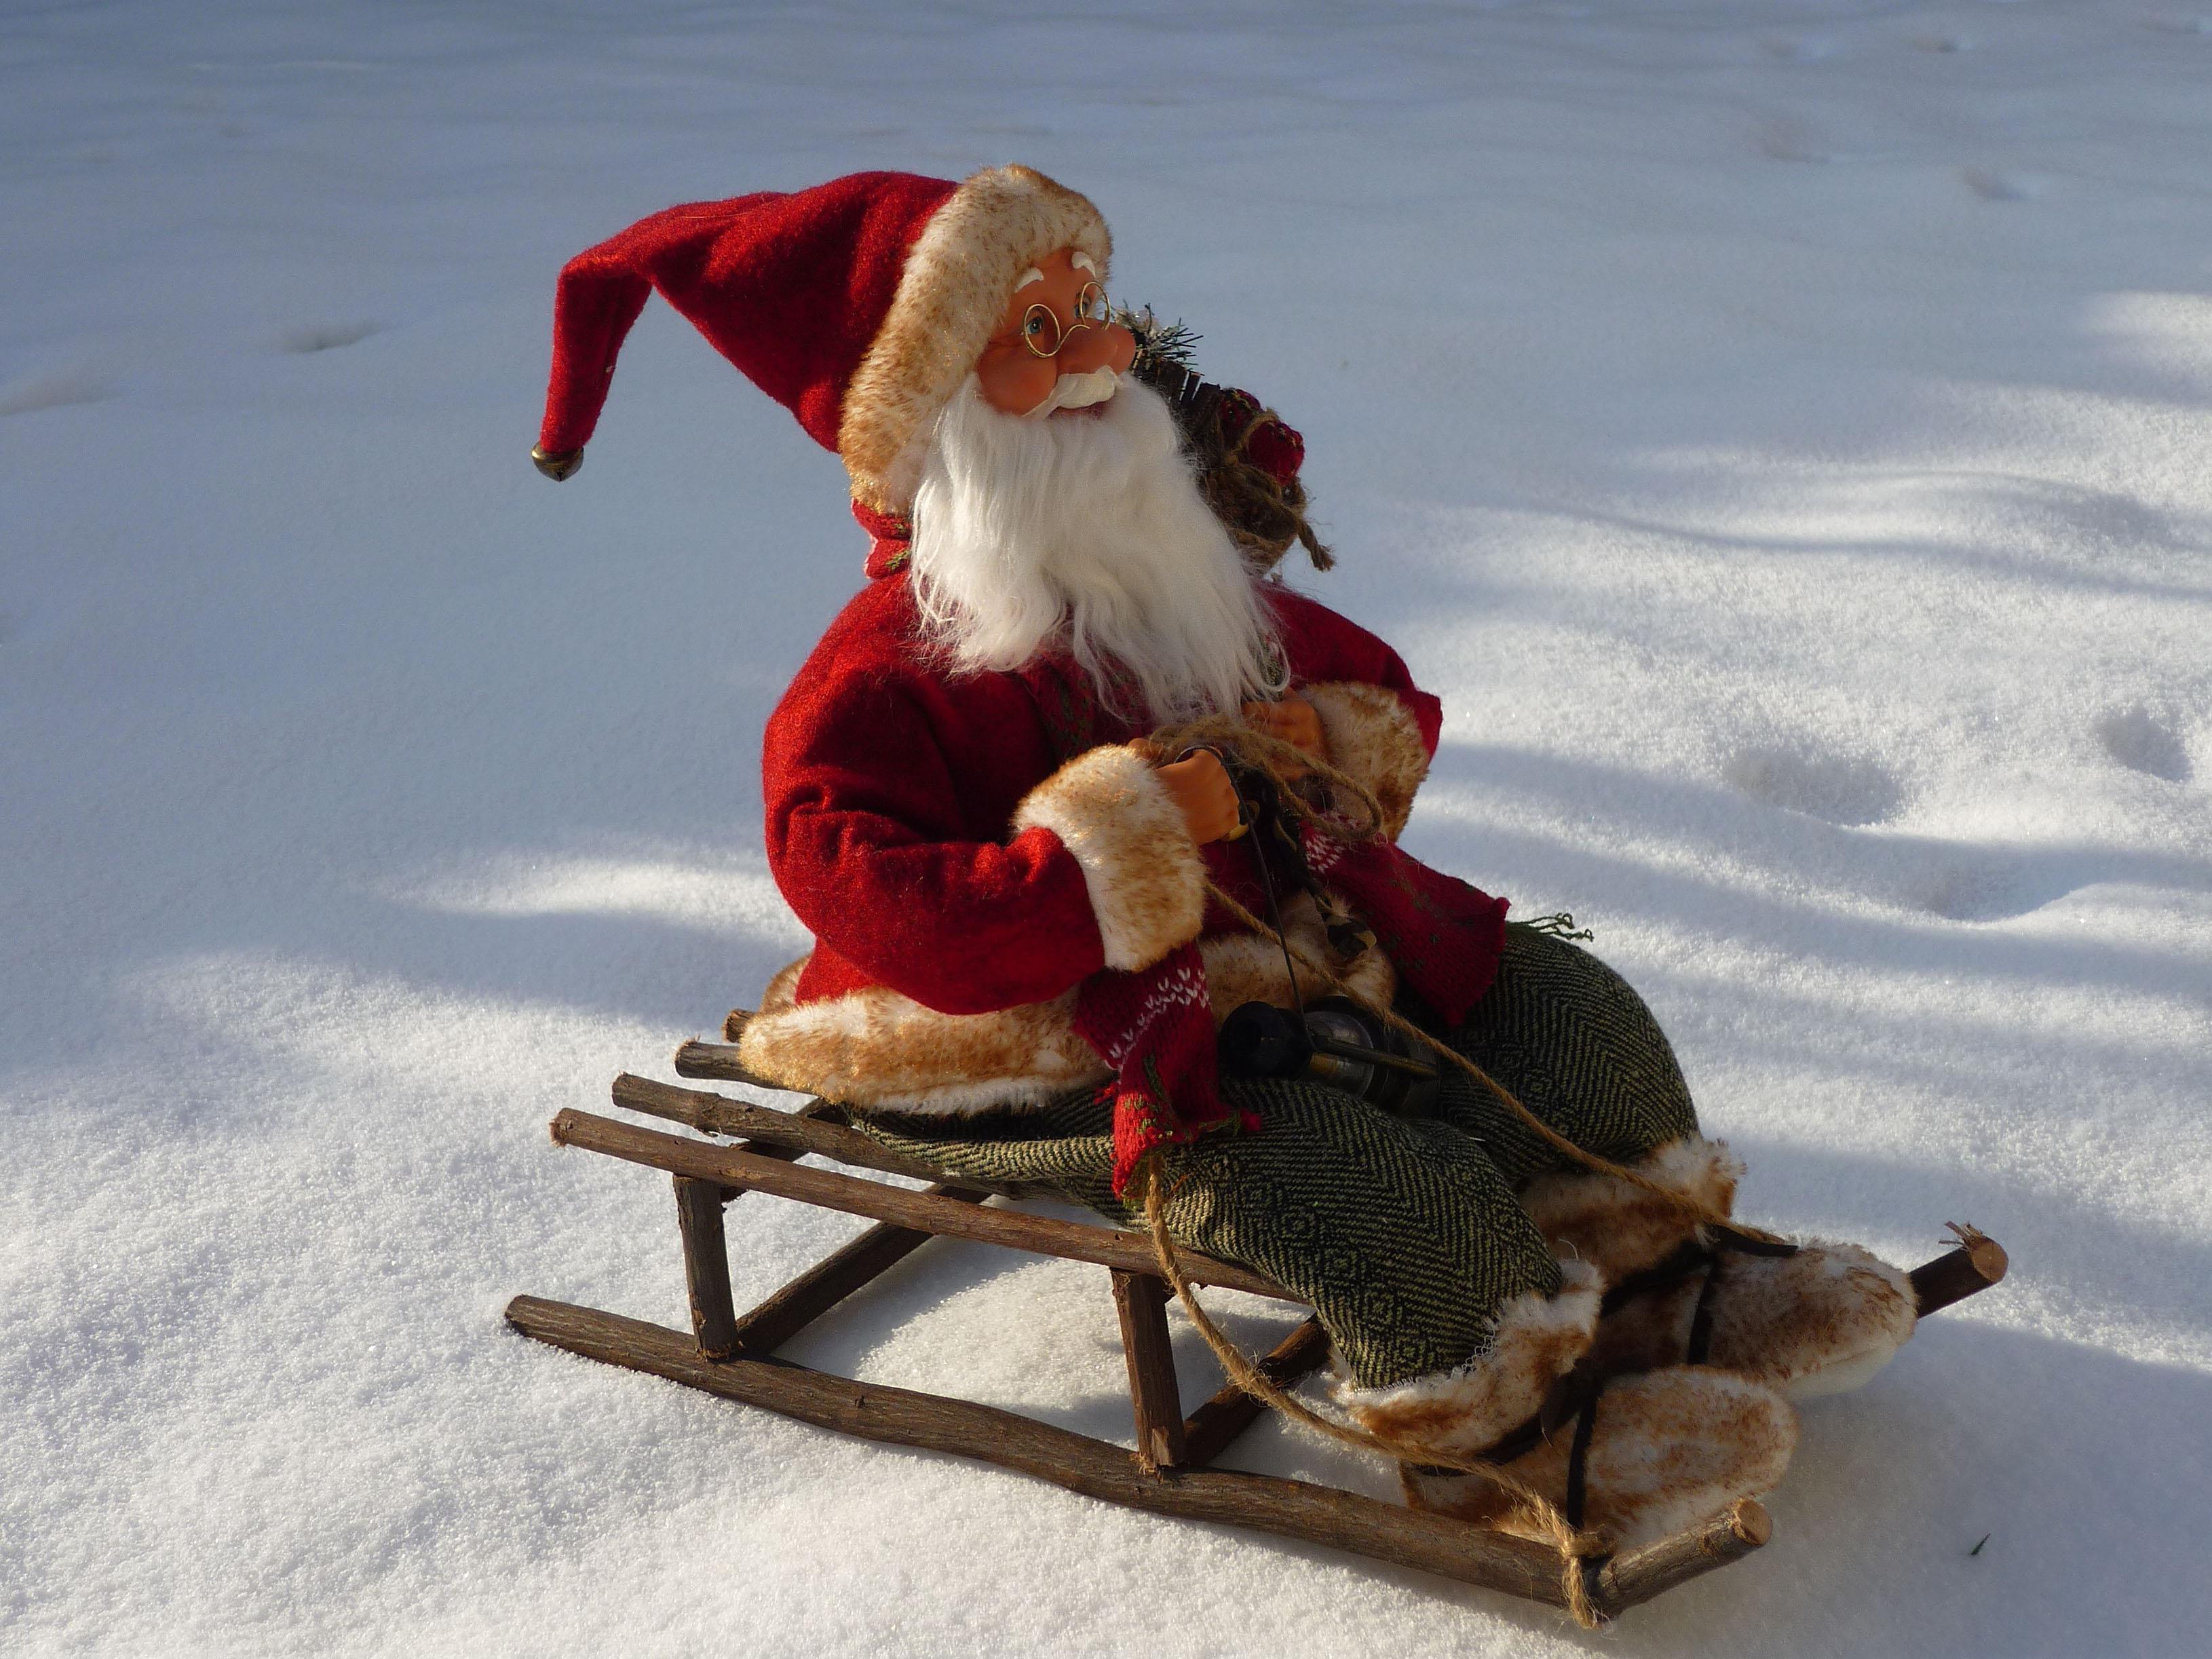 HDoboi.Kiev.ua - Игрушка деда Мороза, Игрушечный Санта на санях